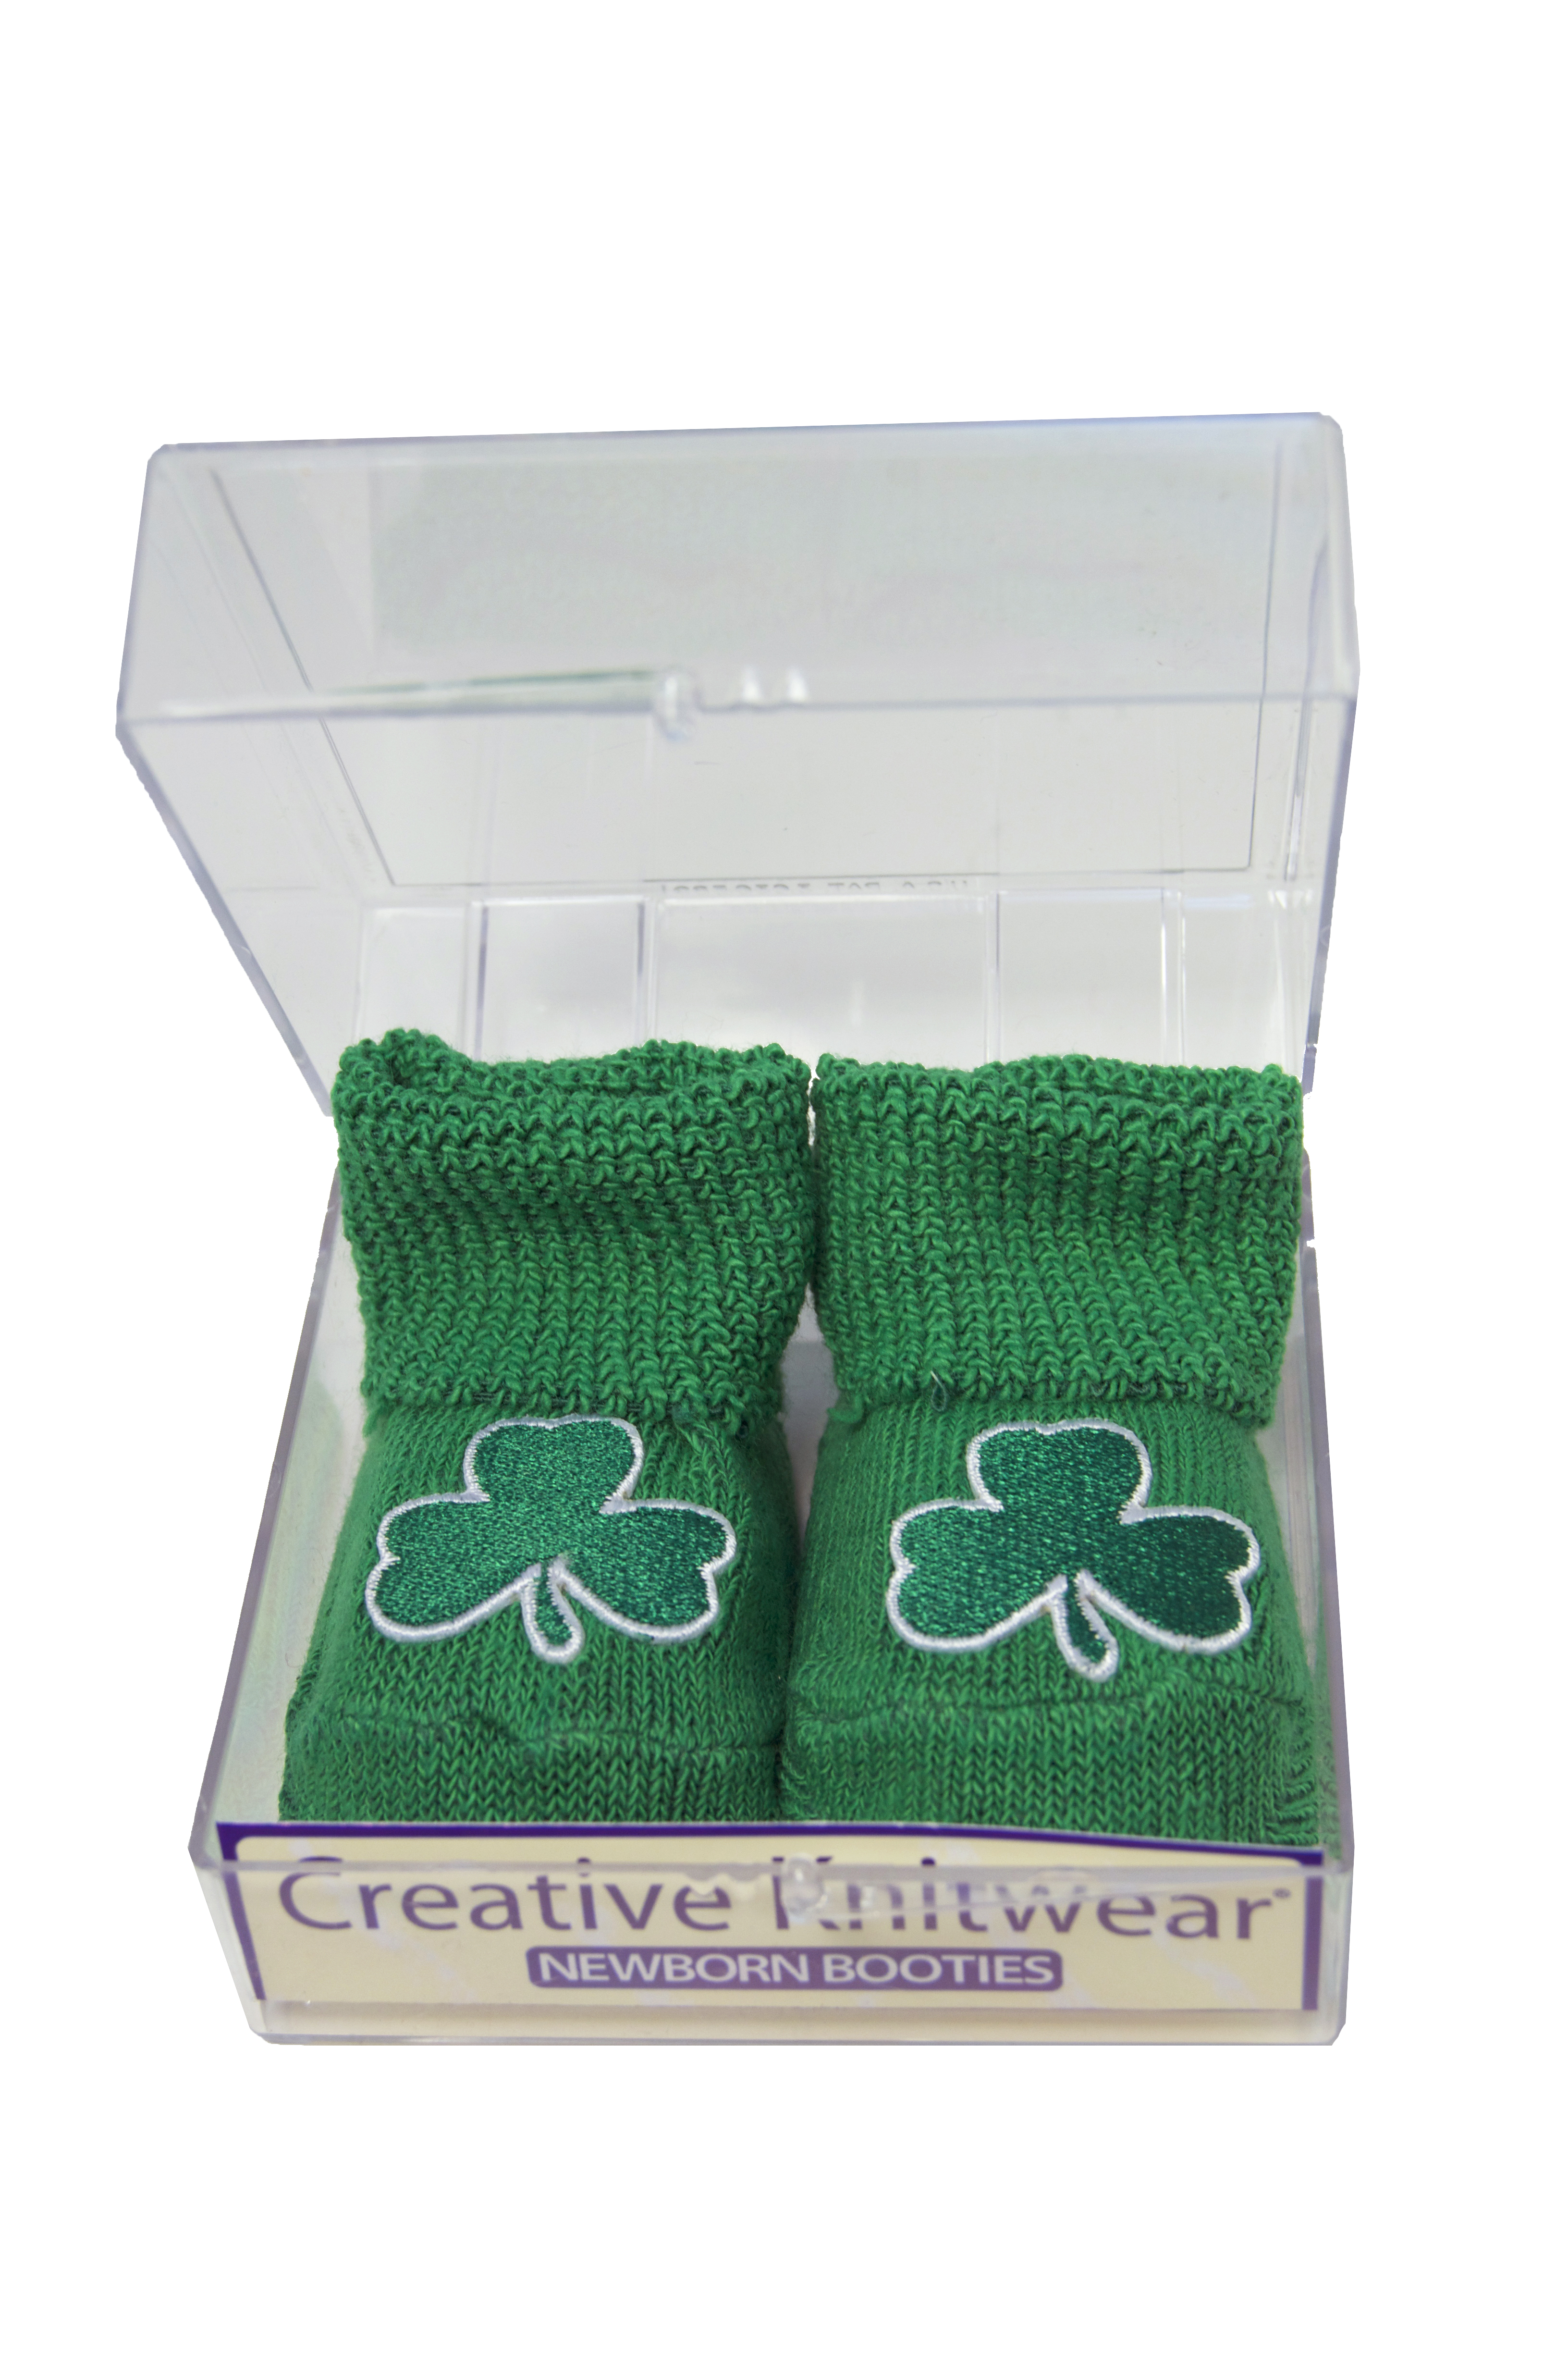 Premature Baby Gifts Ireland : Irish baby booties symbols gift boxed